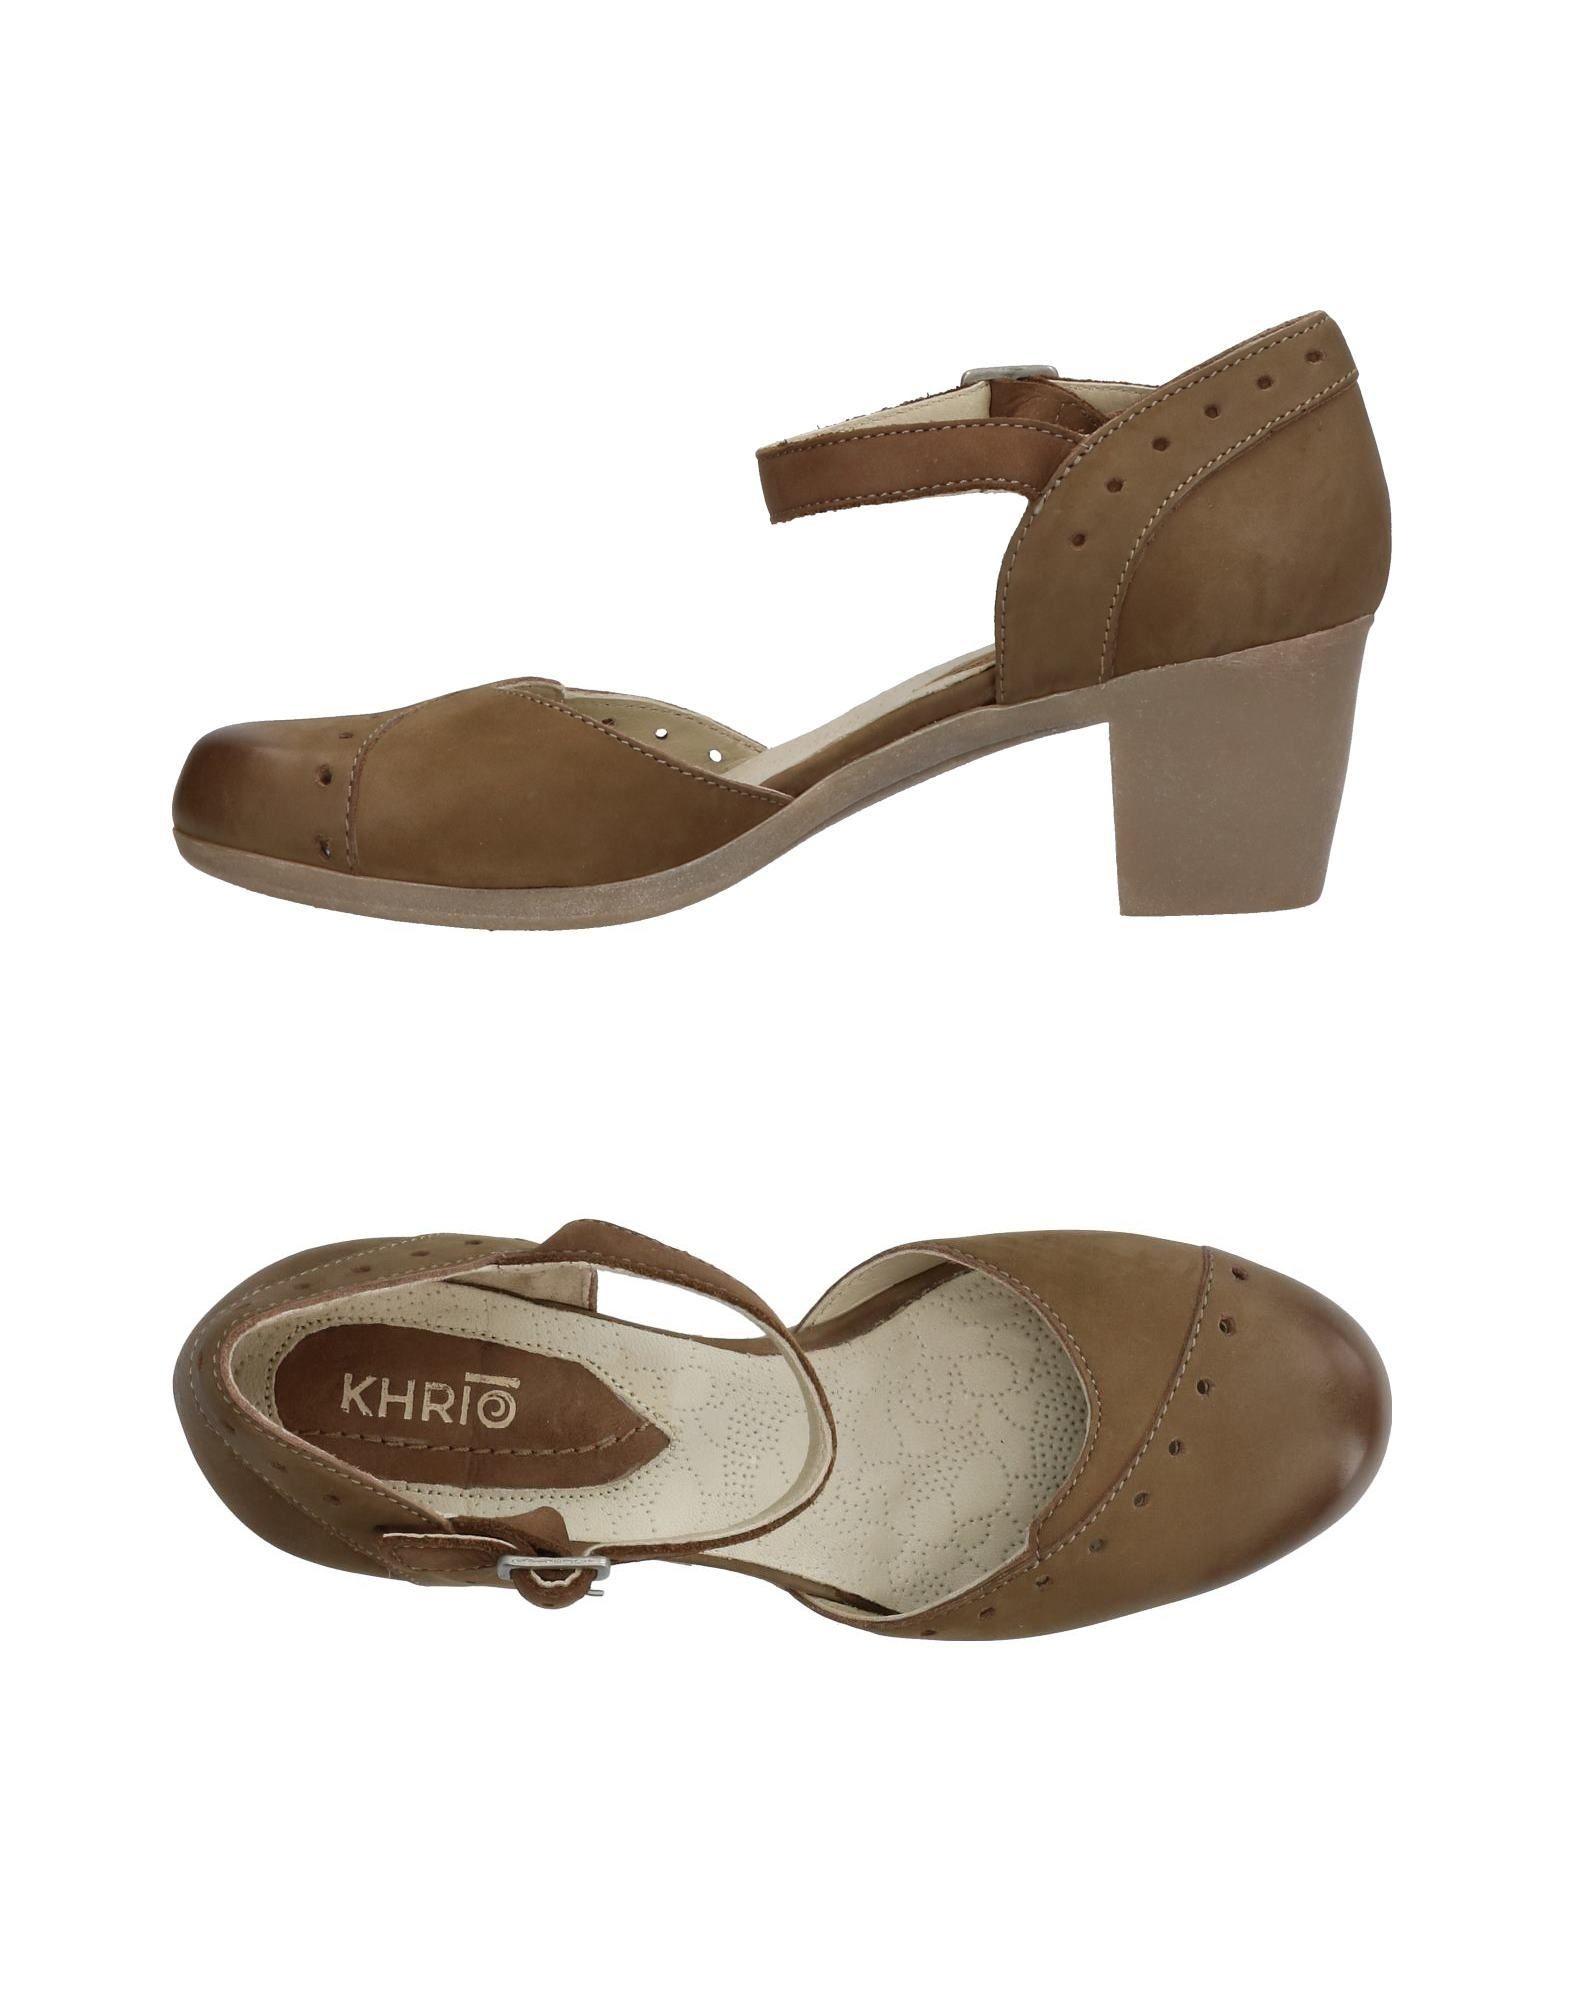 Khrio' Pumps Damen  11326528AJ Gute Qualität beliebte Schuhe